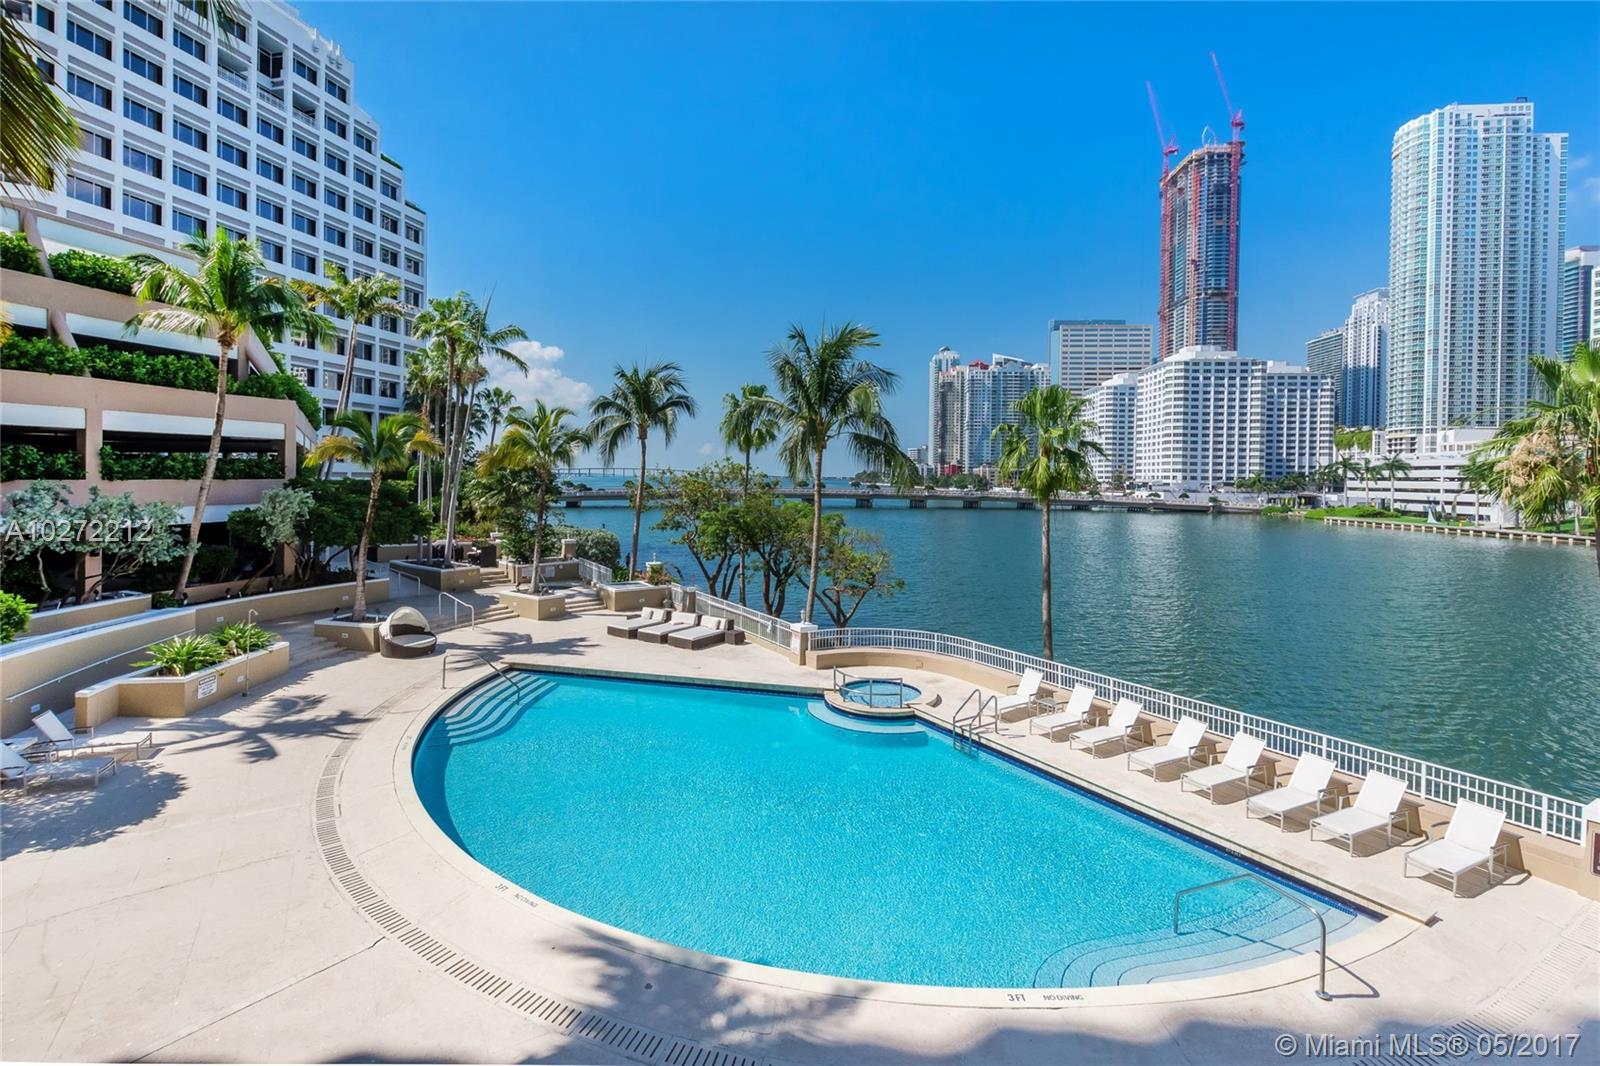 701 Brickell Key Blvd # 712, Miami, FL 33131